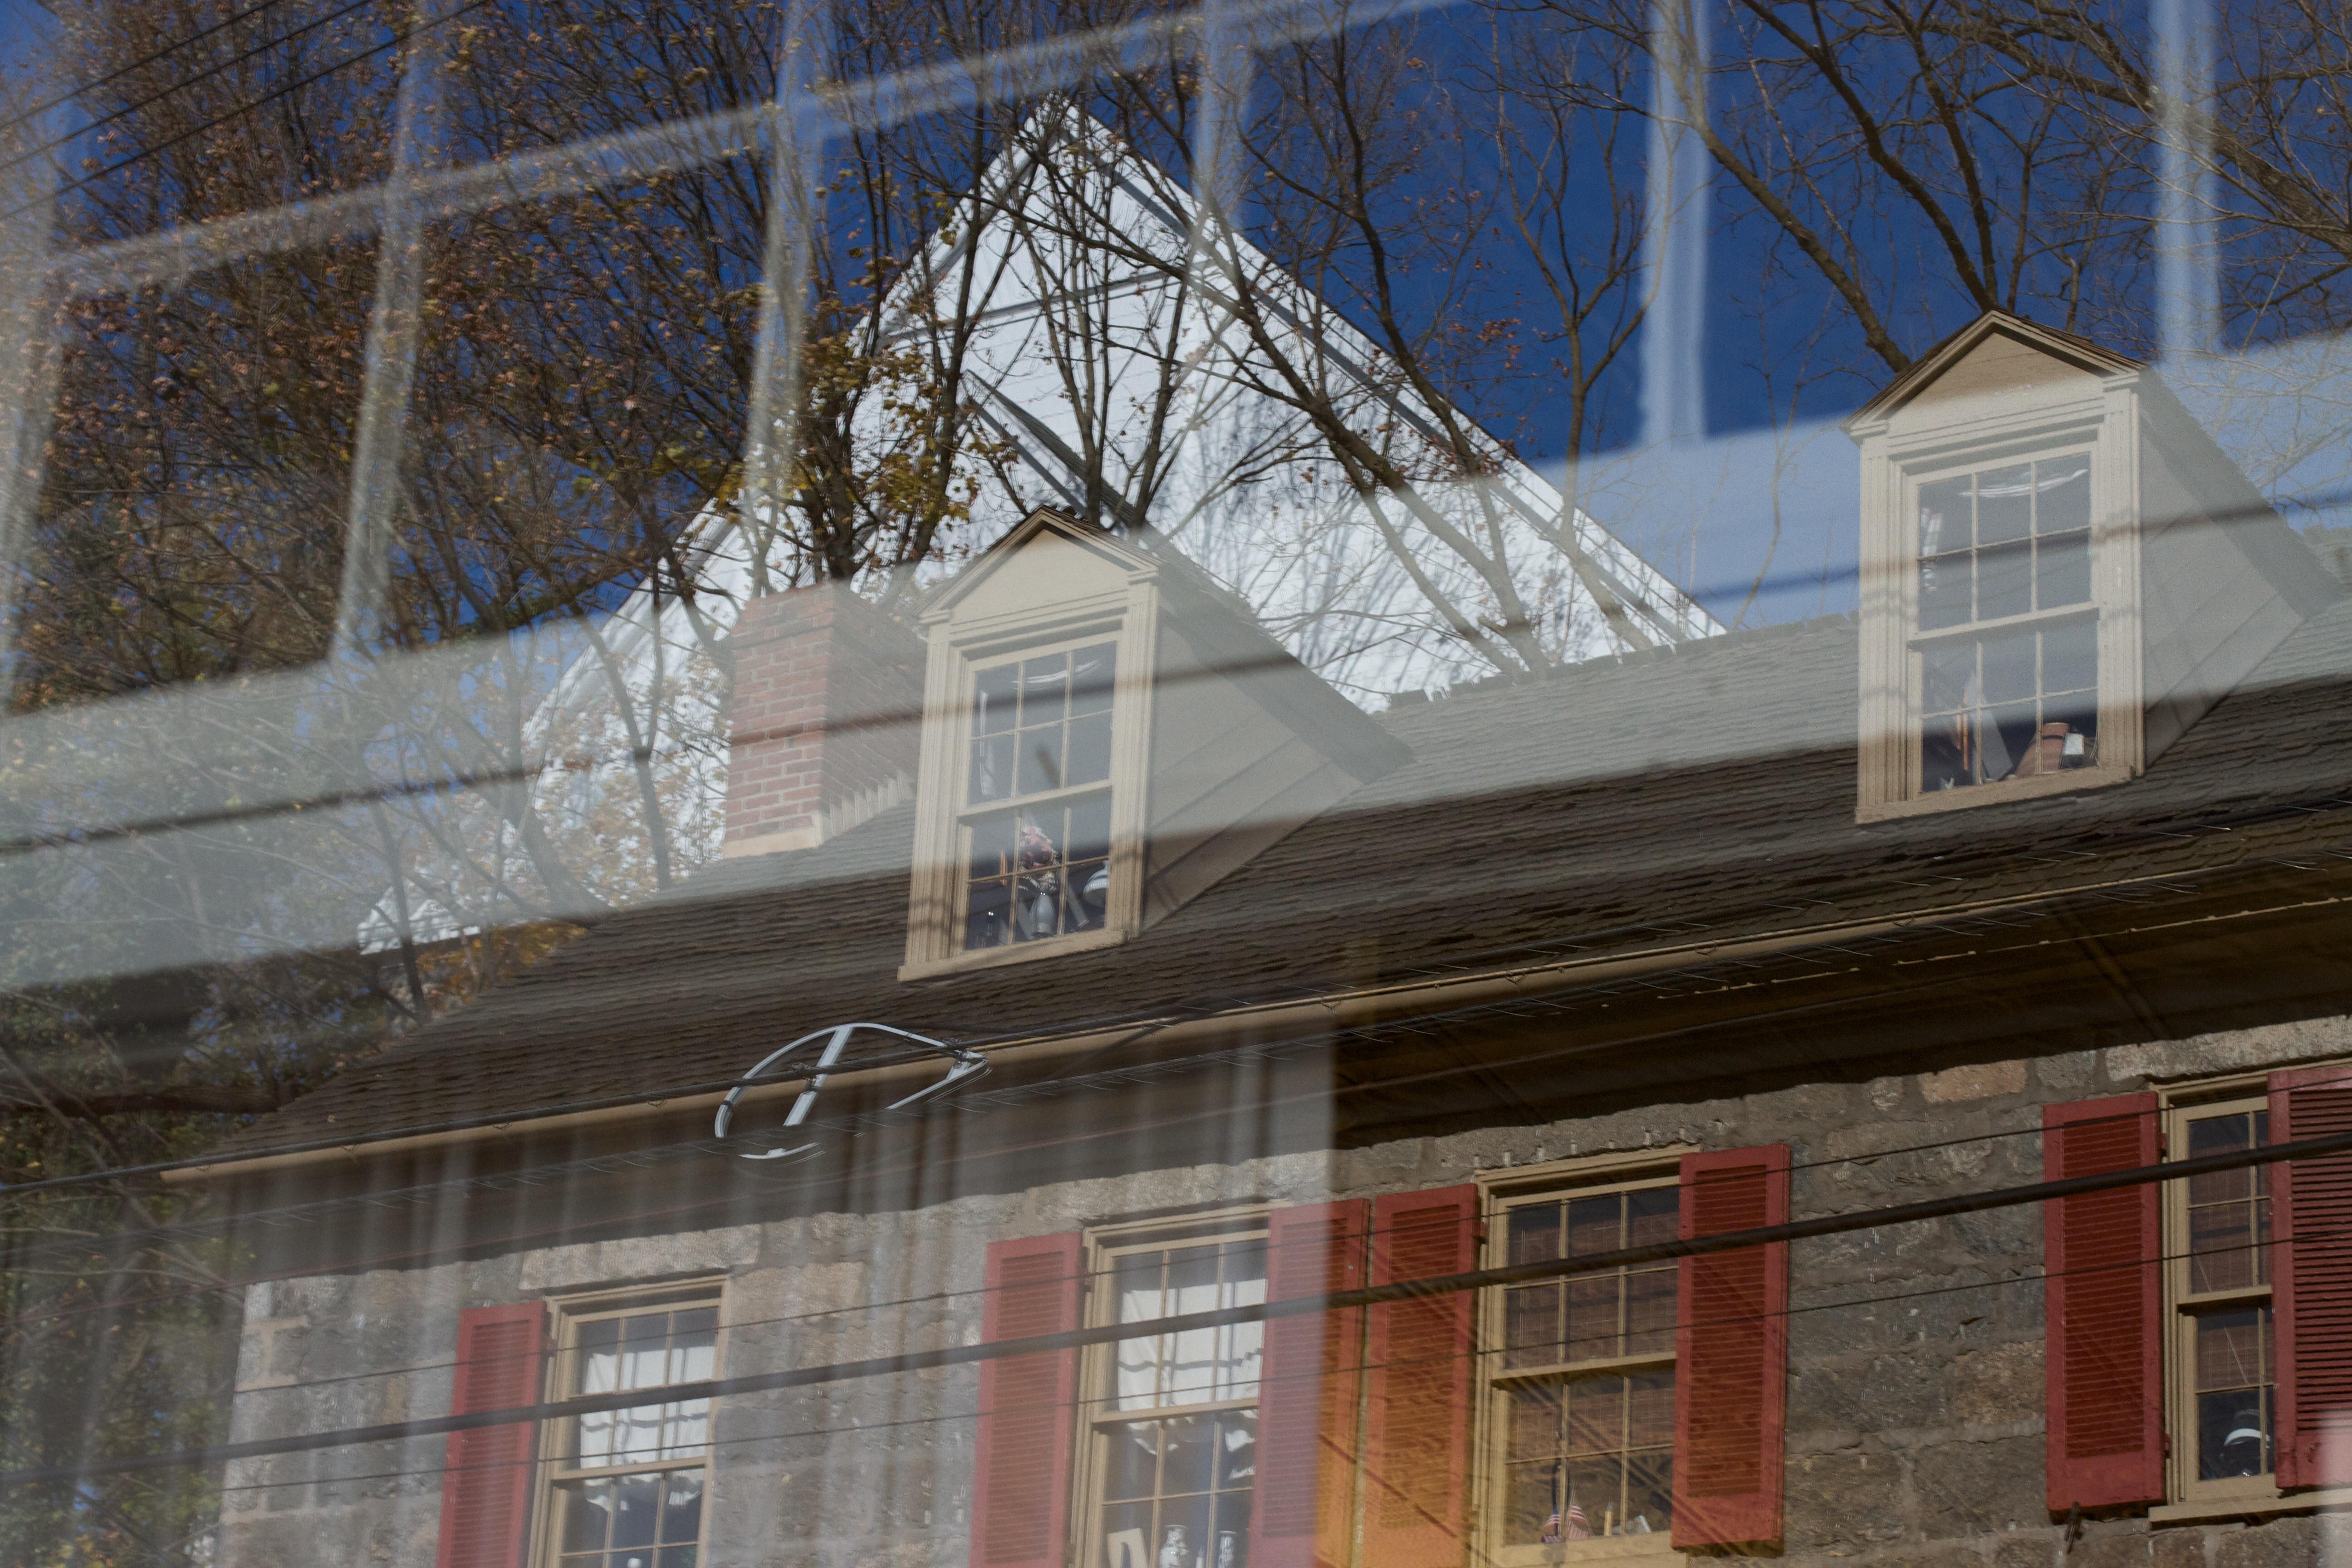 Fotos gratis : arquitectura, estructura, ventana, techo, pared ...